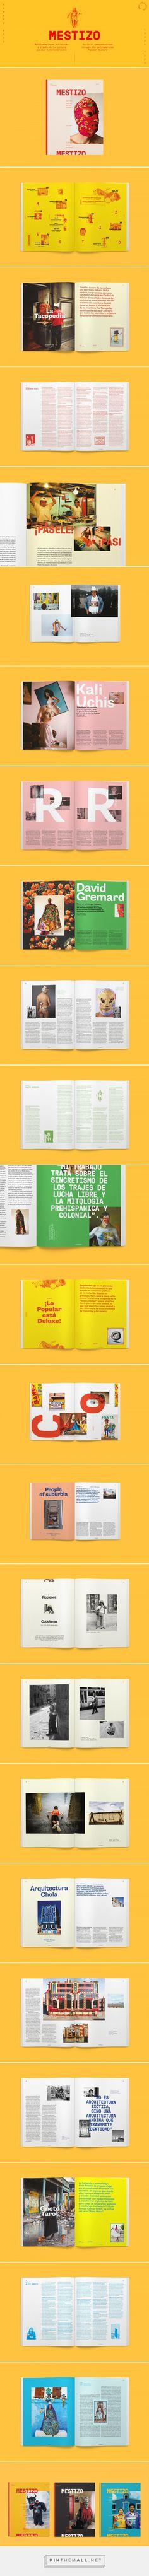 M E S T I Z O Magazine |Nº 0 on Behance - created via https://pinthemall.net